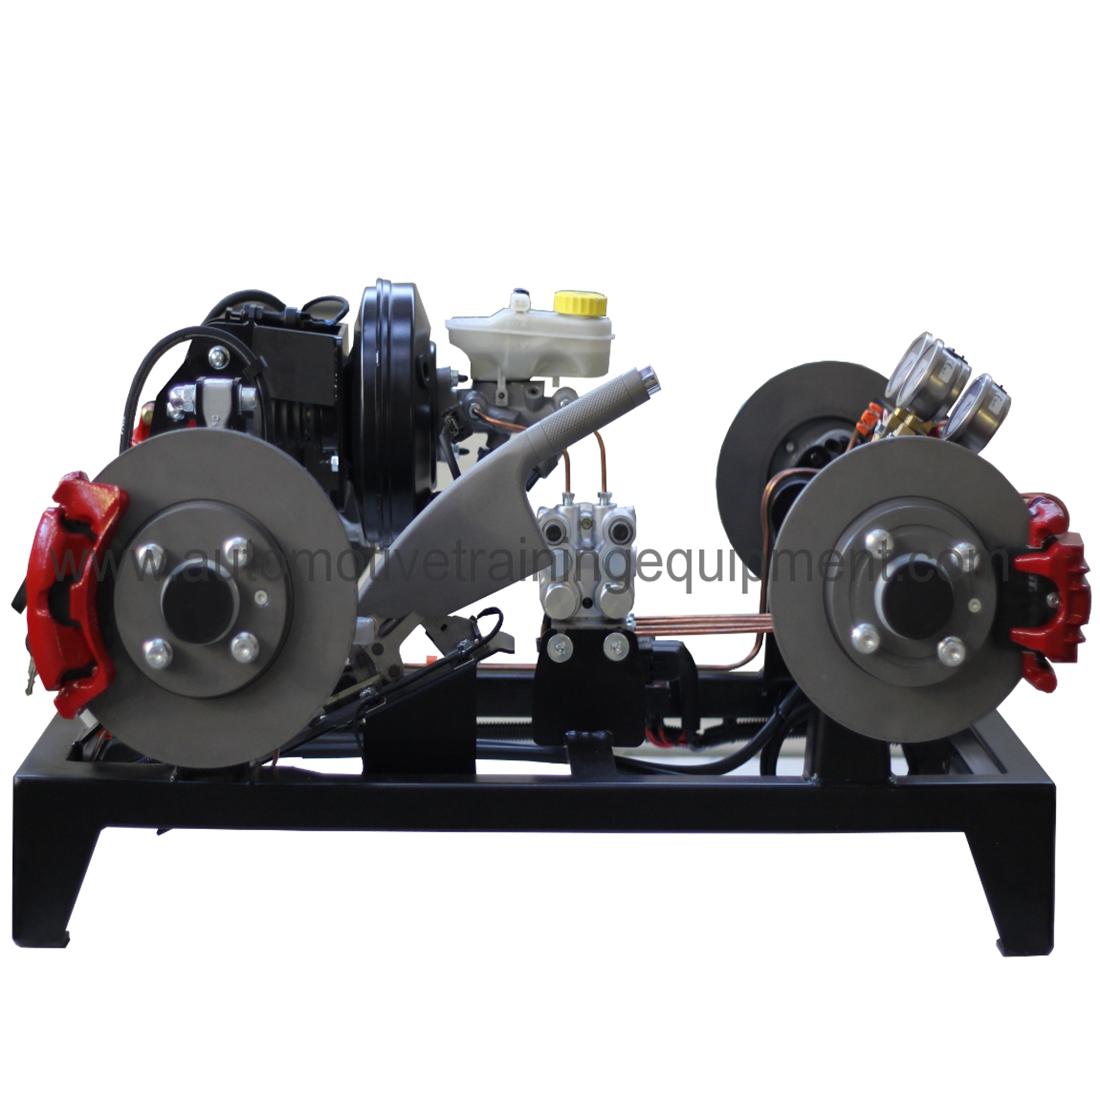 Braking system rig bench version